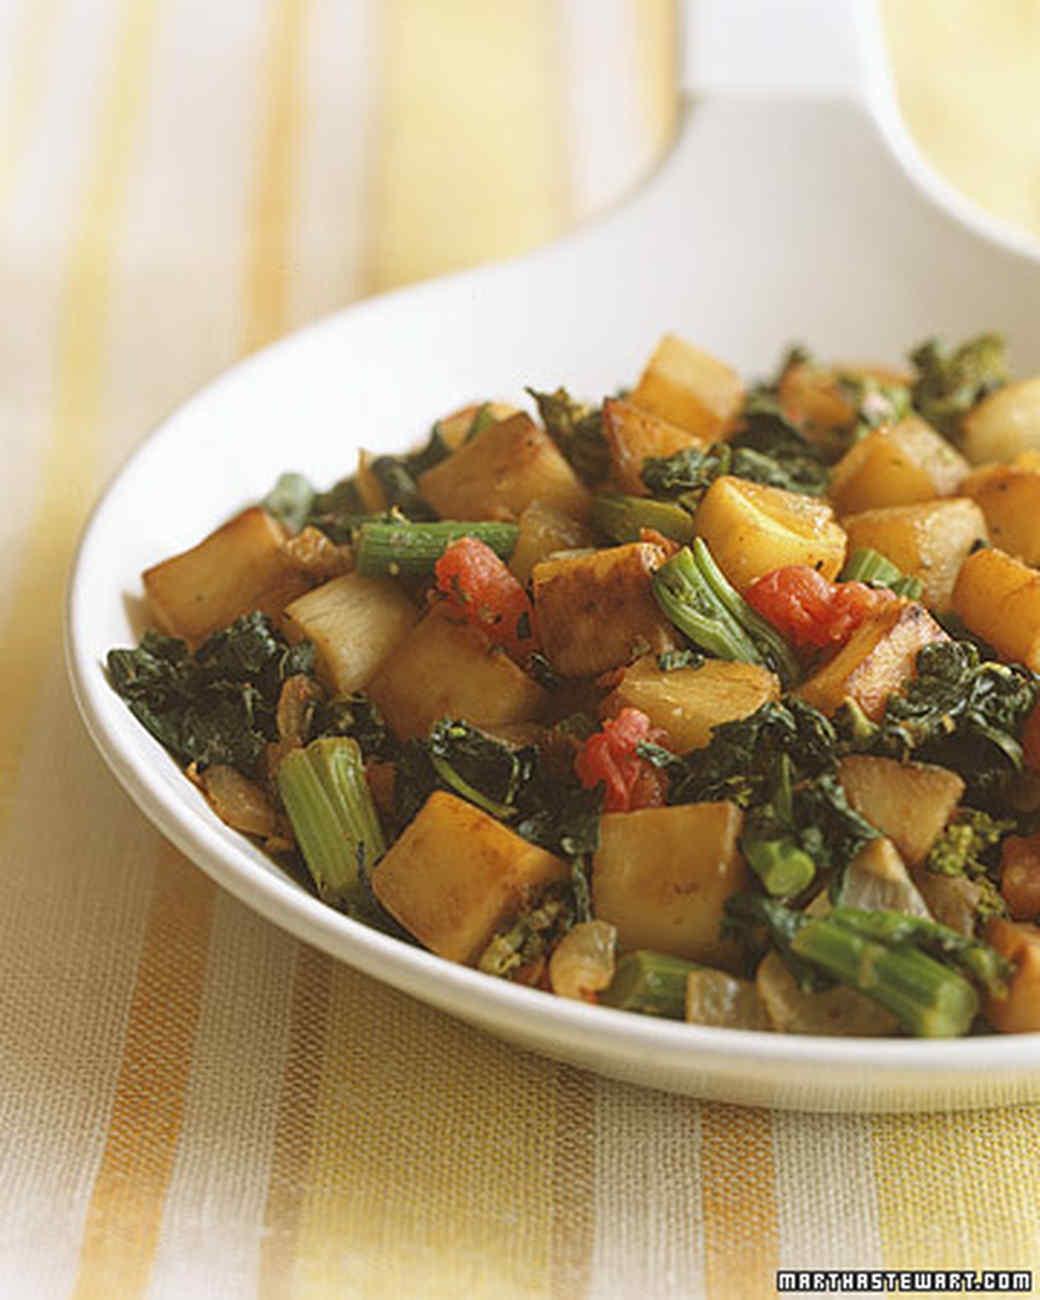 Turnip Hash with Broccoli Rabe